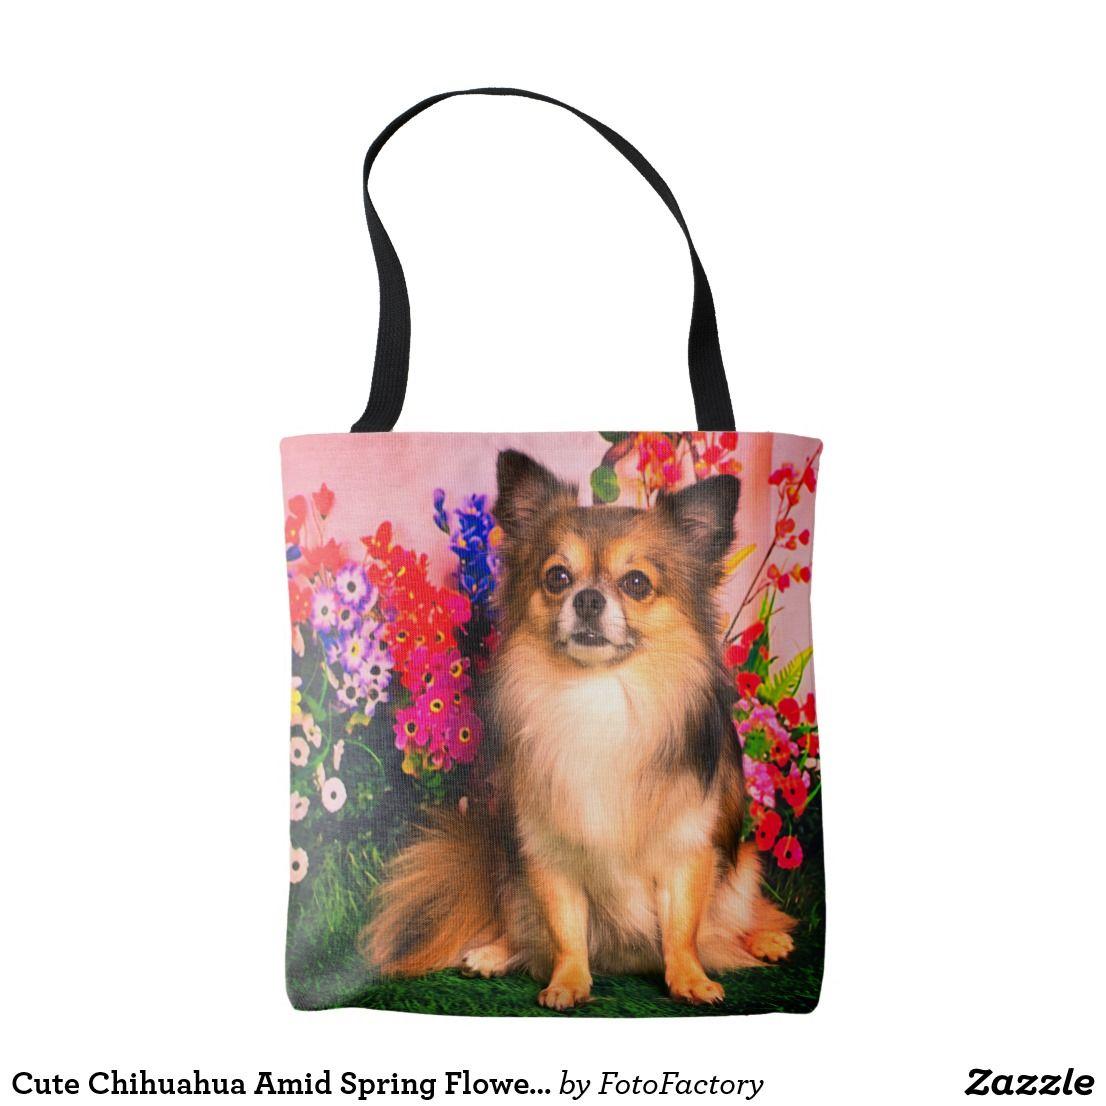 Cute chihuahua amid spring flowers tote bag